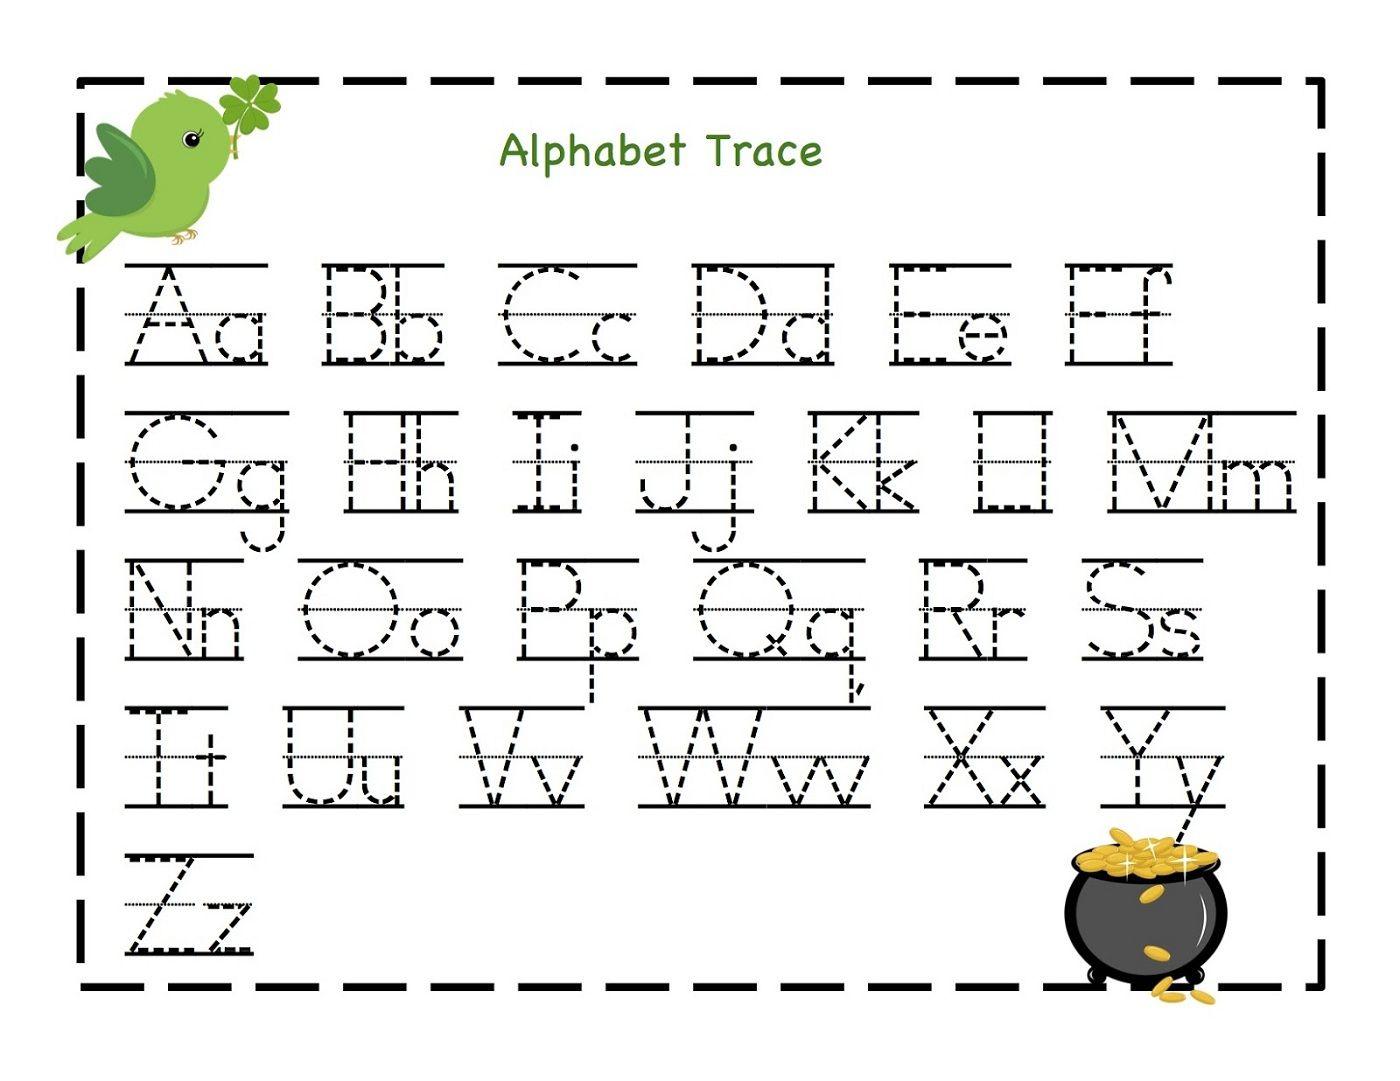 Kindergarten Alphabet Worksheets – With Workbooks Also Literacy For | Alphabet Worksheets For Preschoolers Printable